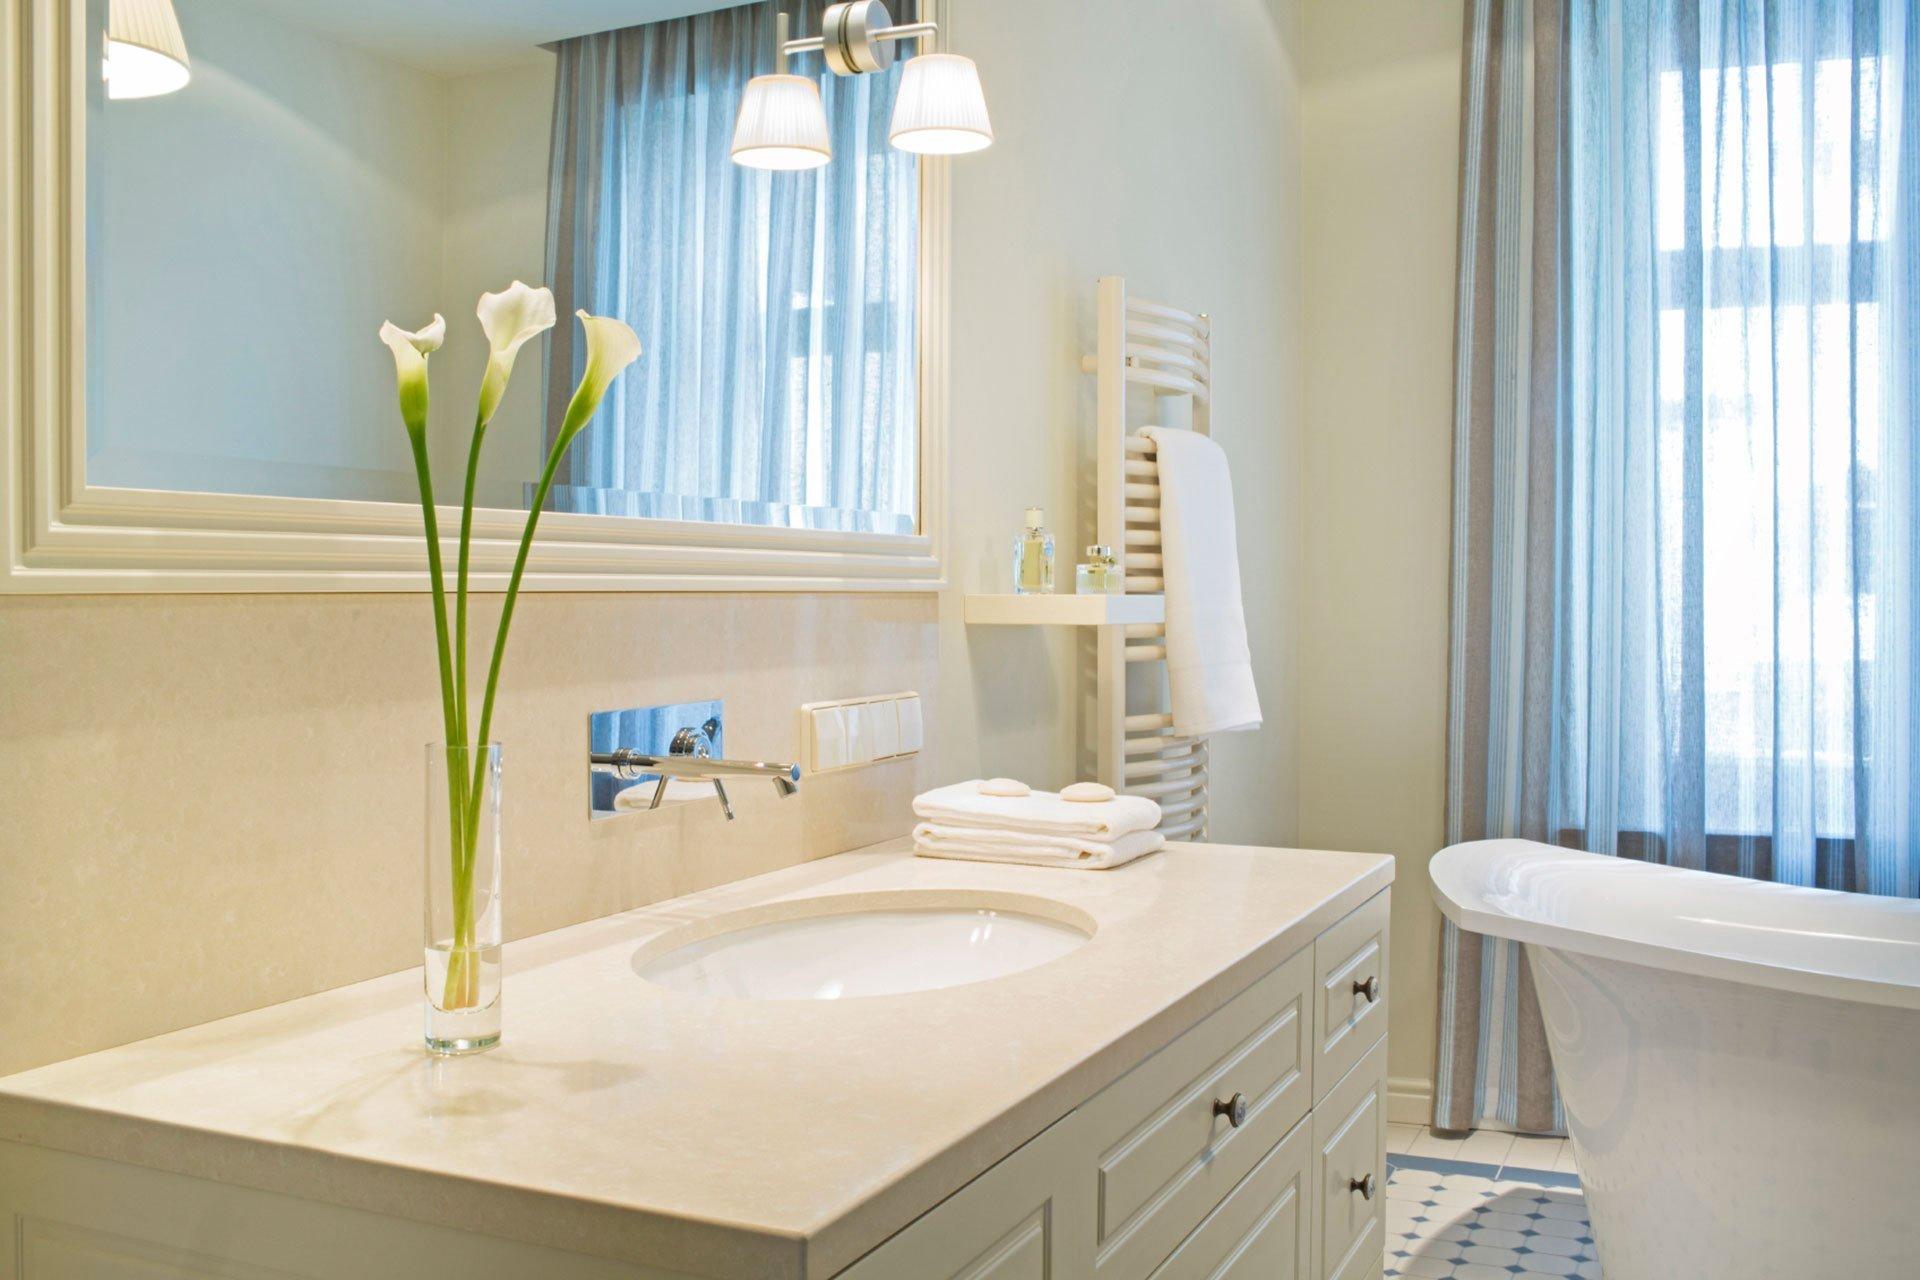 Bathroom remodeling albany ny - Bathroom Remodeling Schenectady Ny